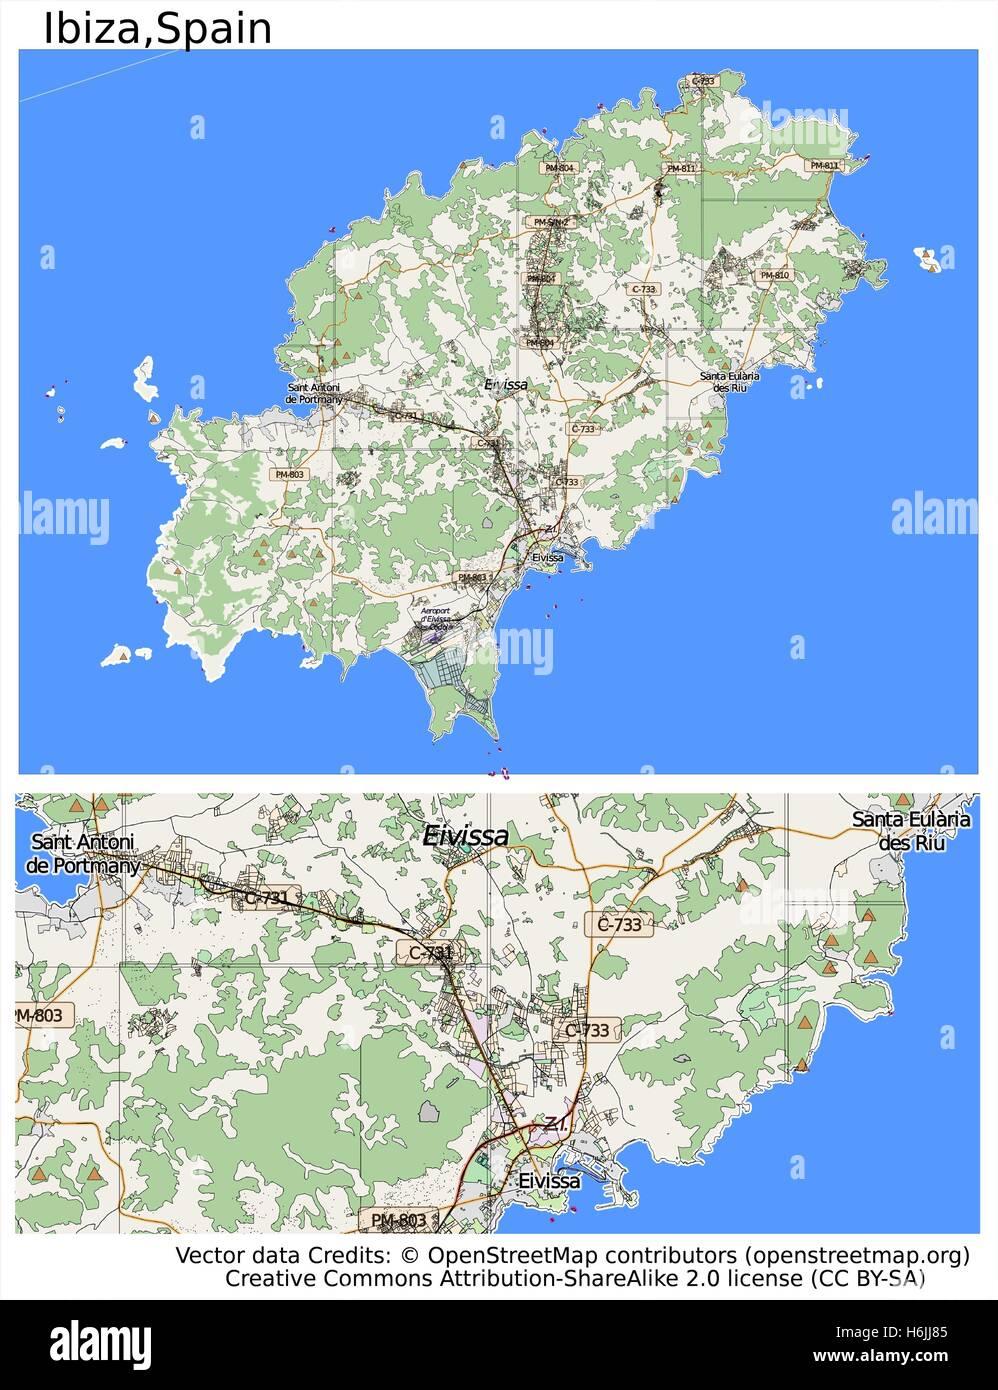 Ibiza Spain city map Stock Vector Art Illustration Vector Image